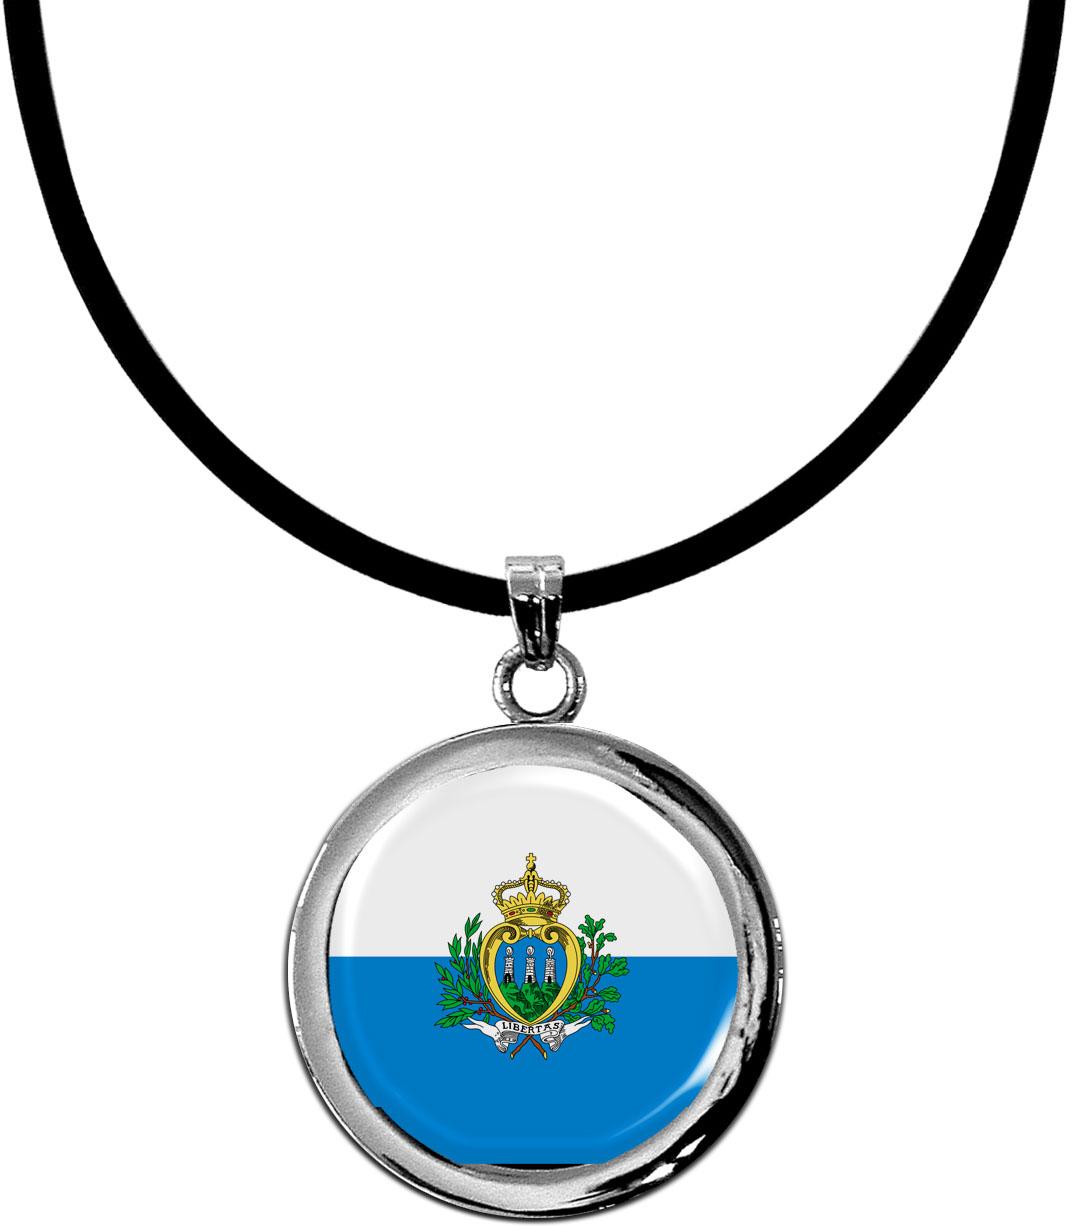 Kettenanhänger / San Marino / Silikonband mit Silberverschluss